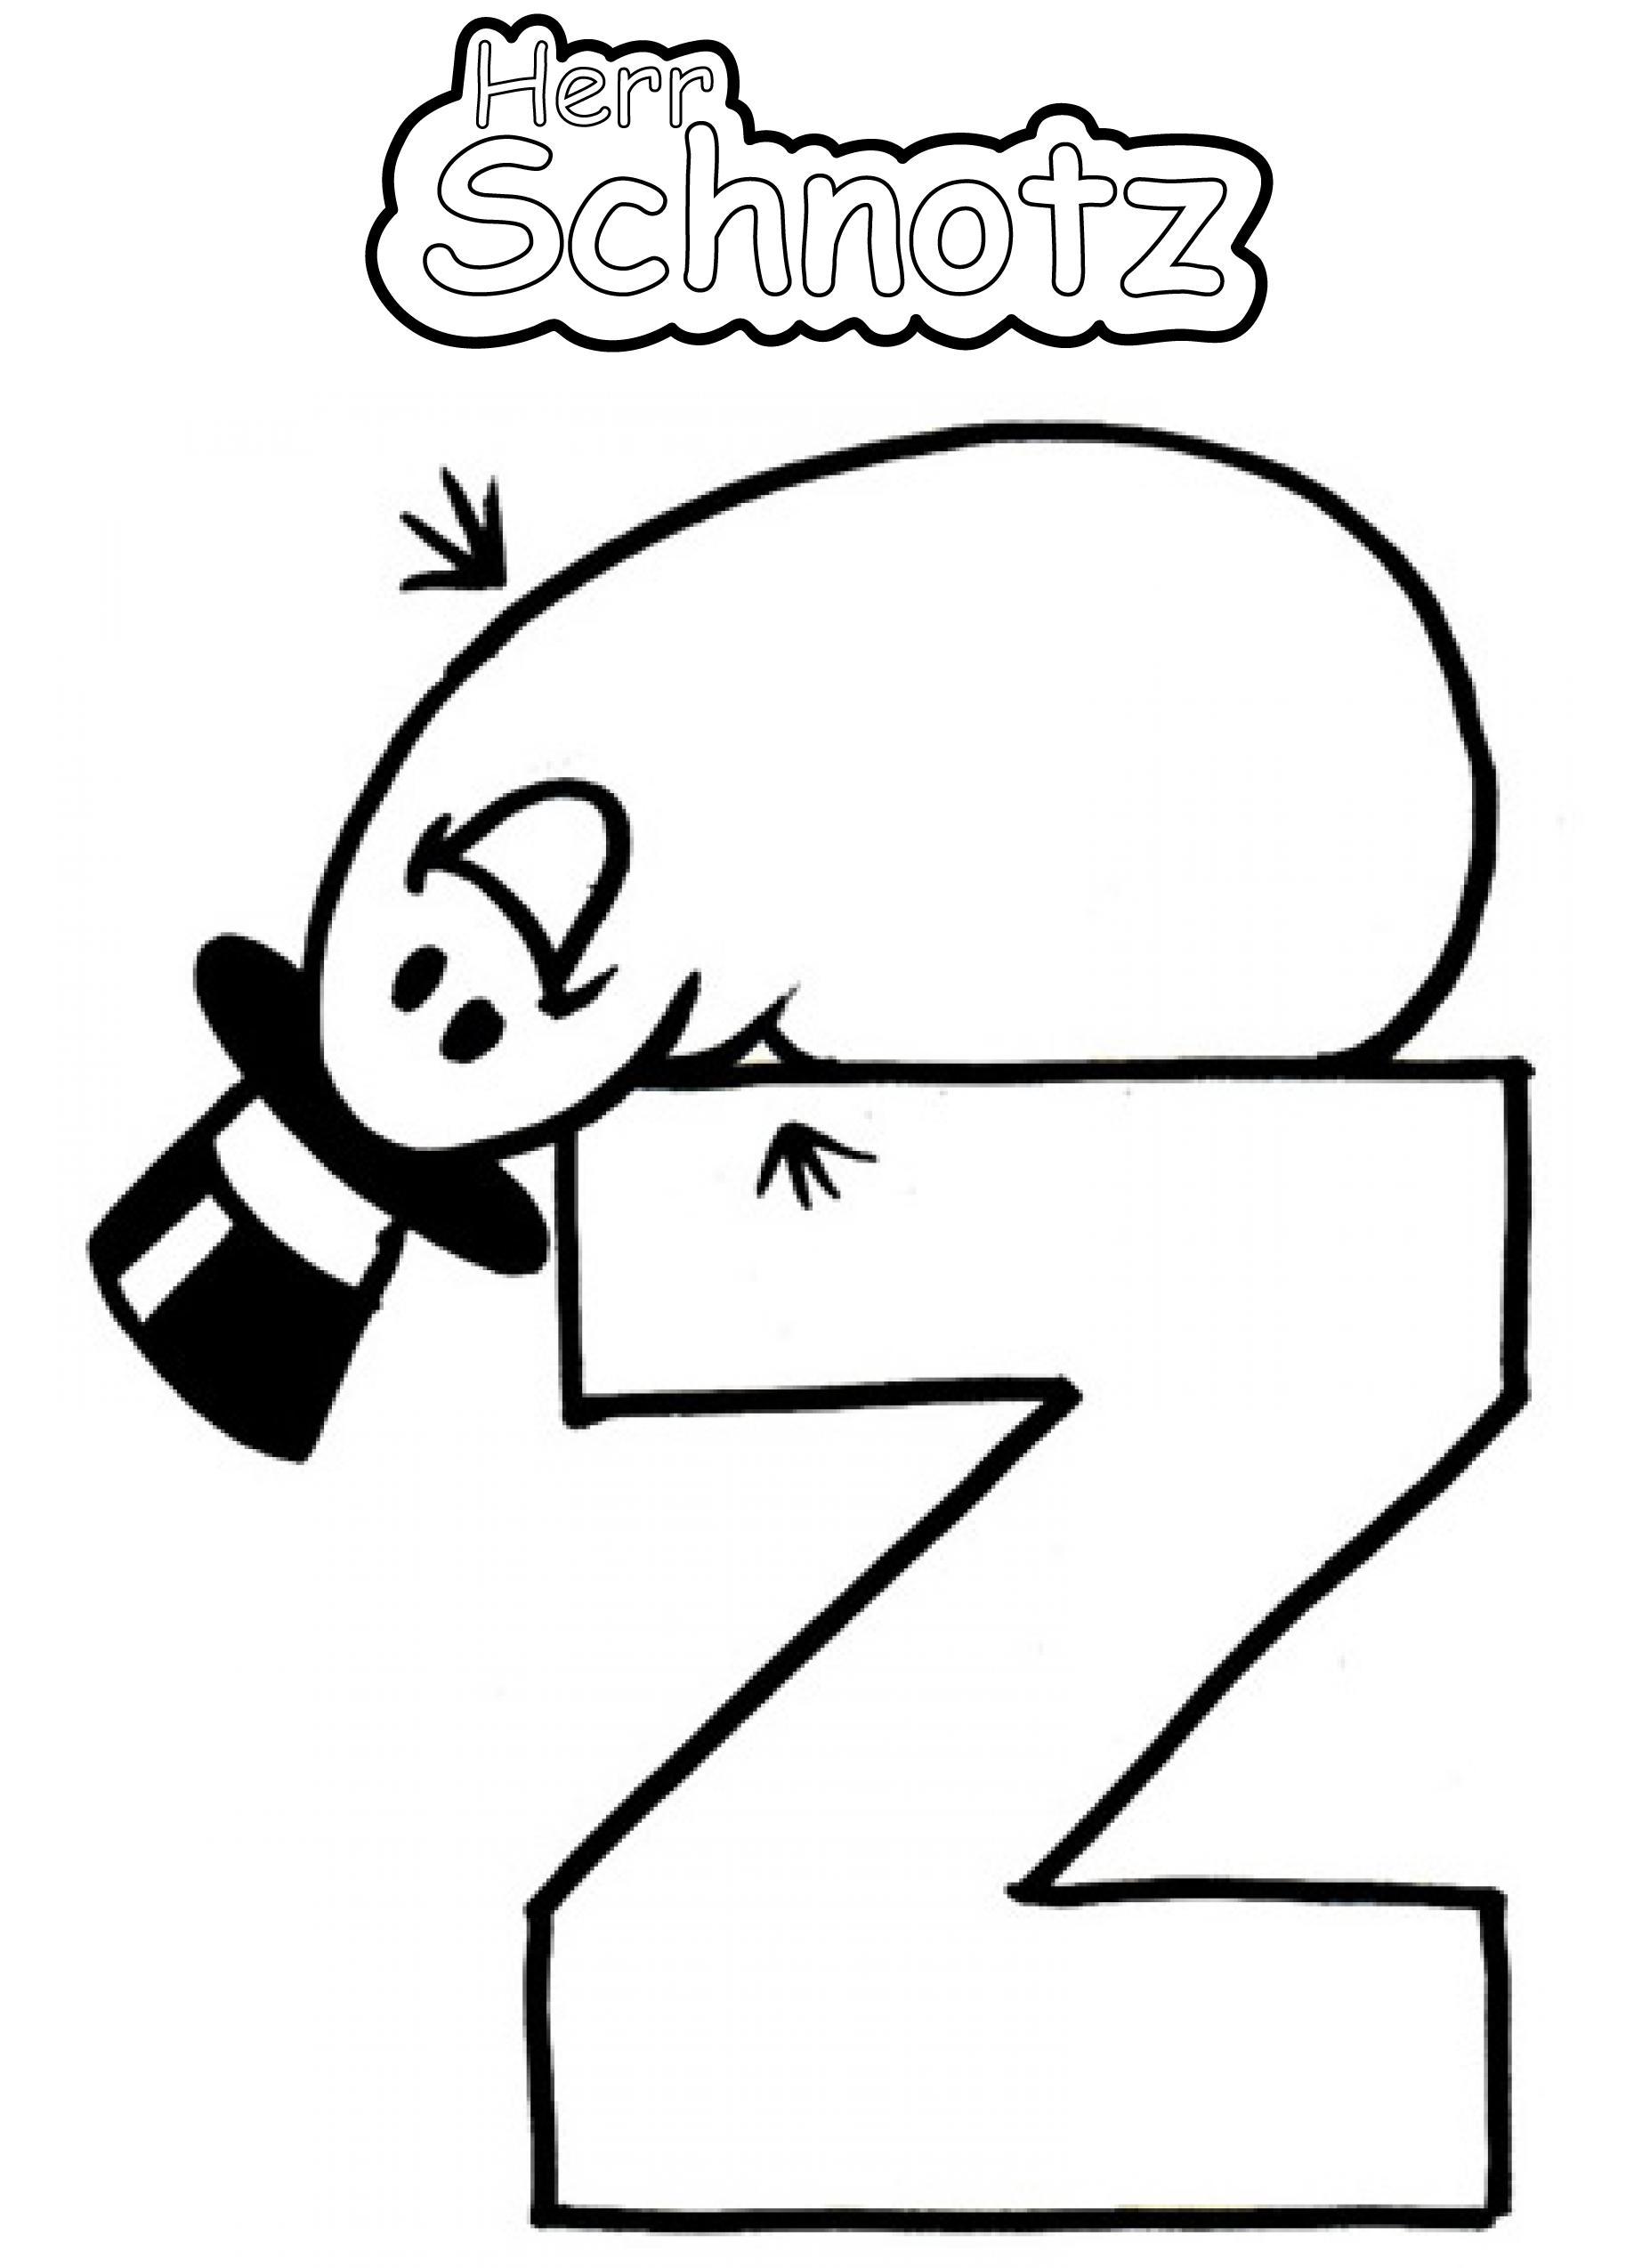 Alphabeth - Z